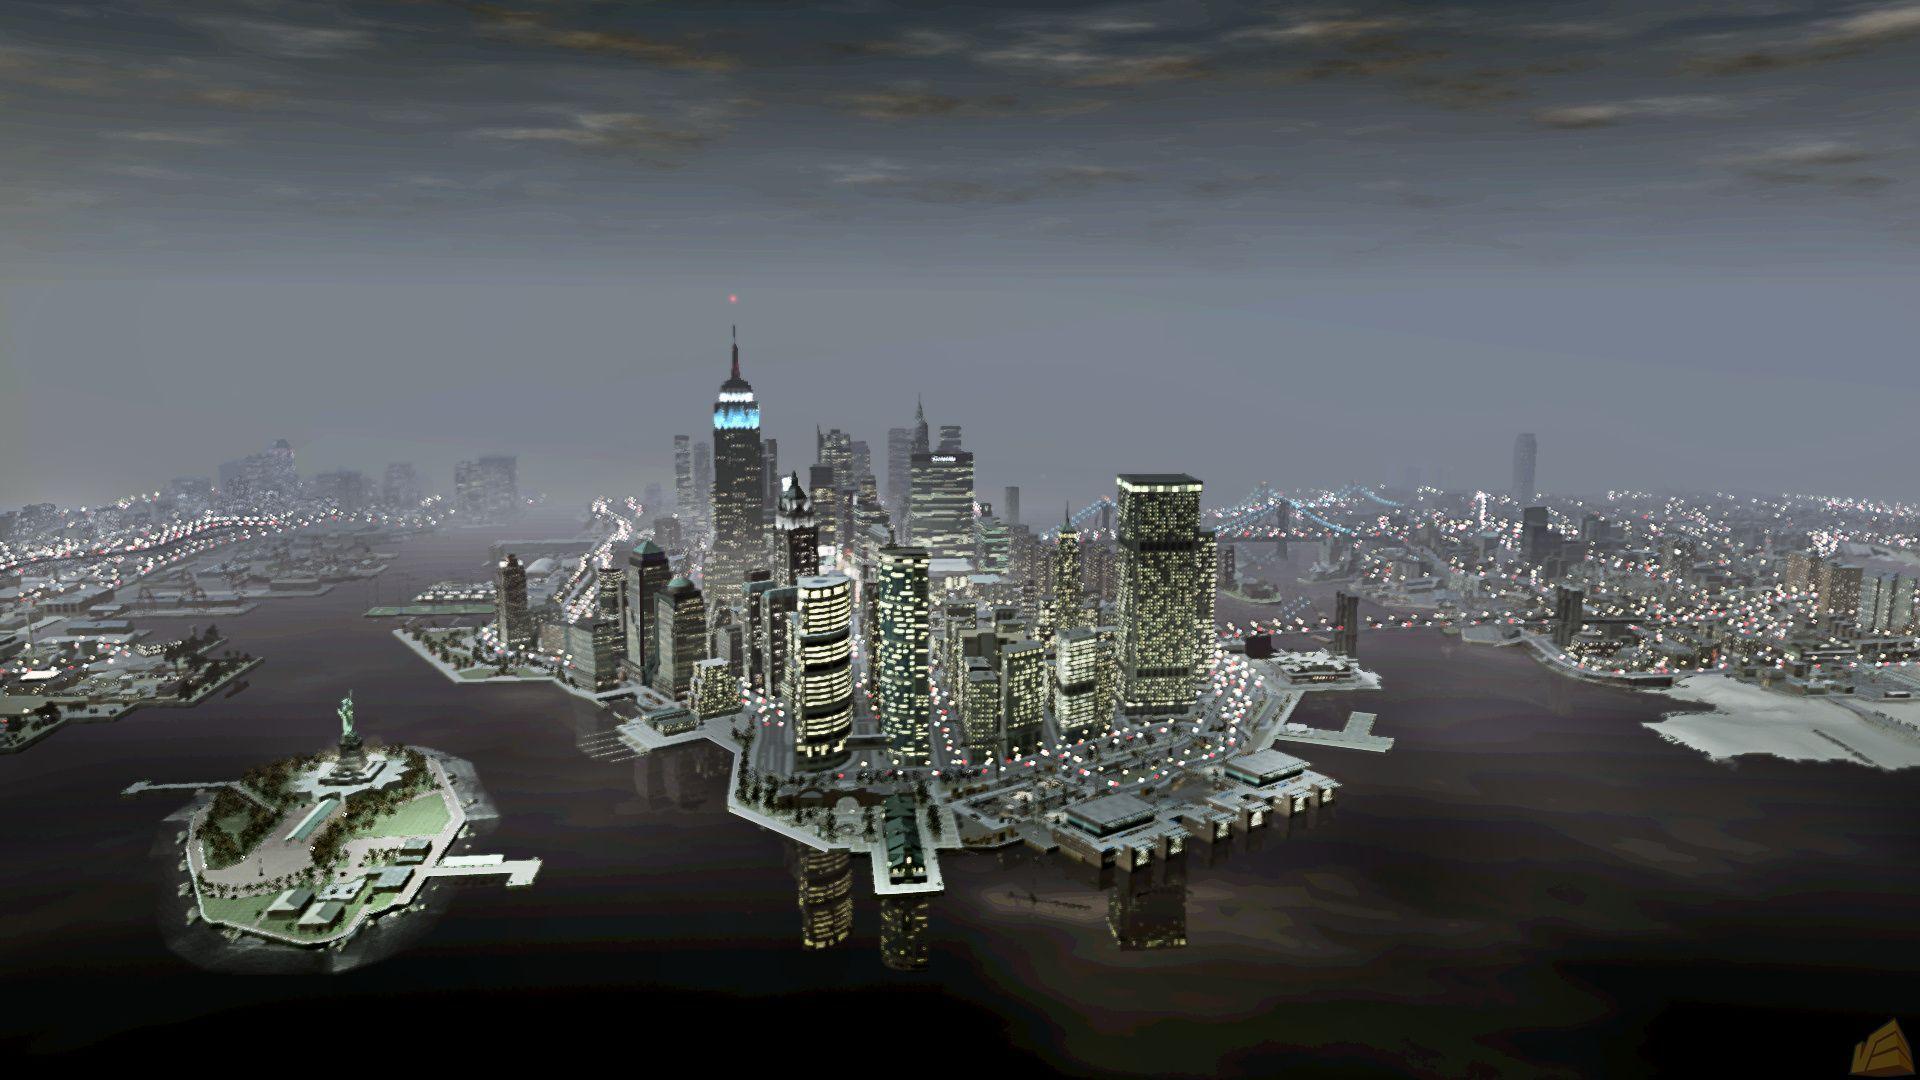 Newyorkcityskylinelibertyislandnight Liberty City Hd Universe Gta Wiki The Grand Theft Auto Wiki Gta